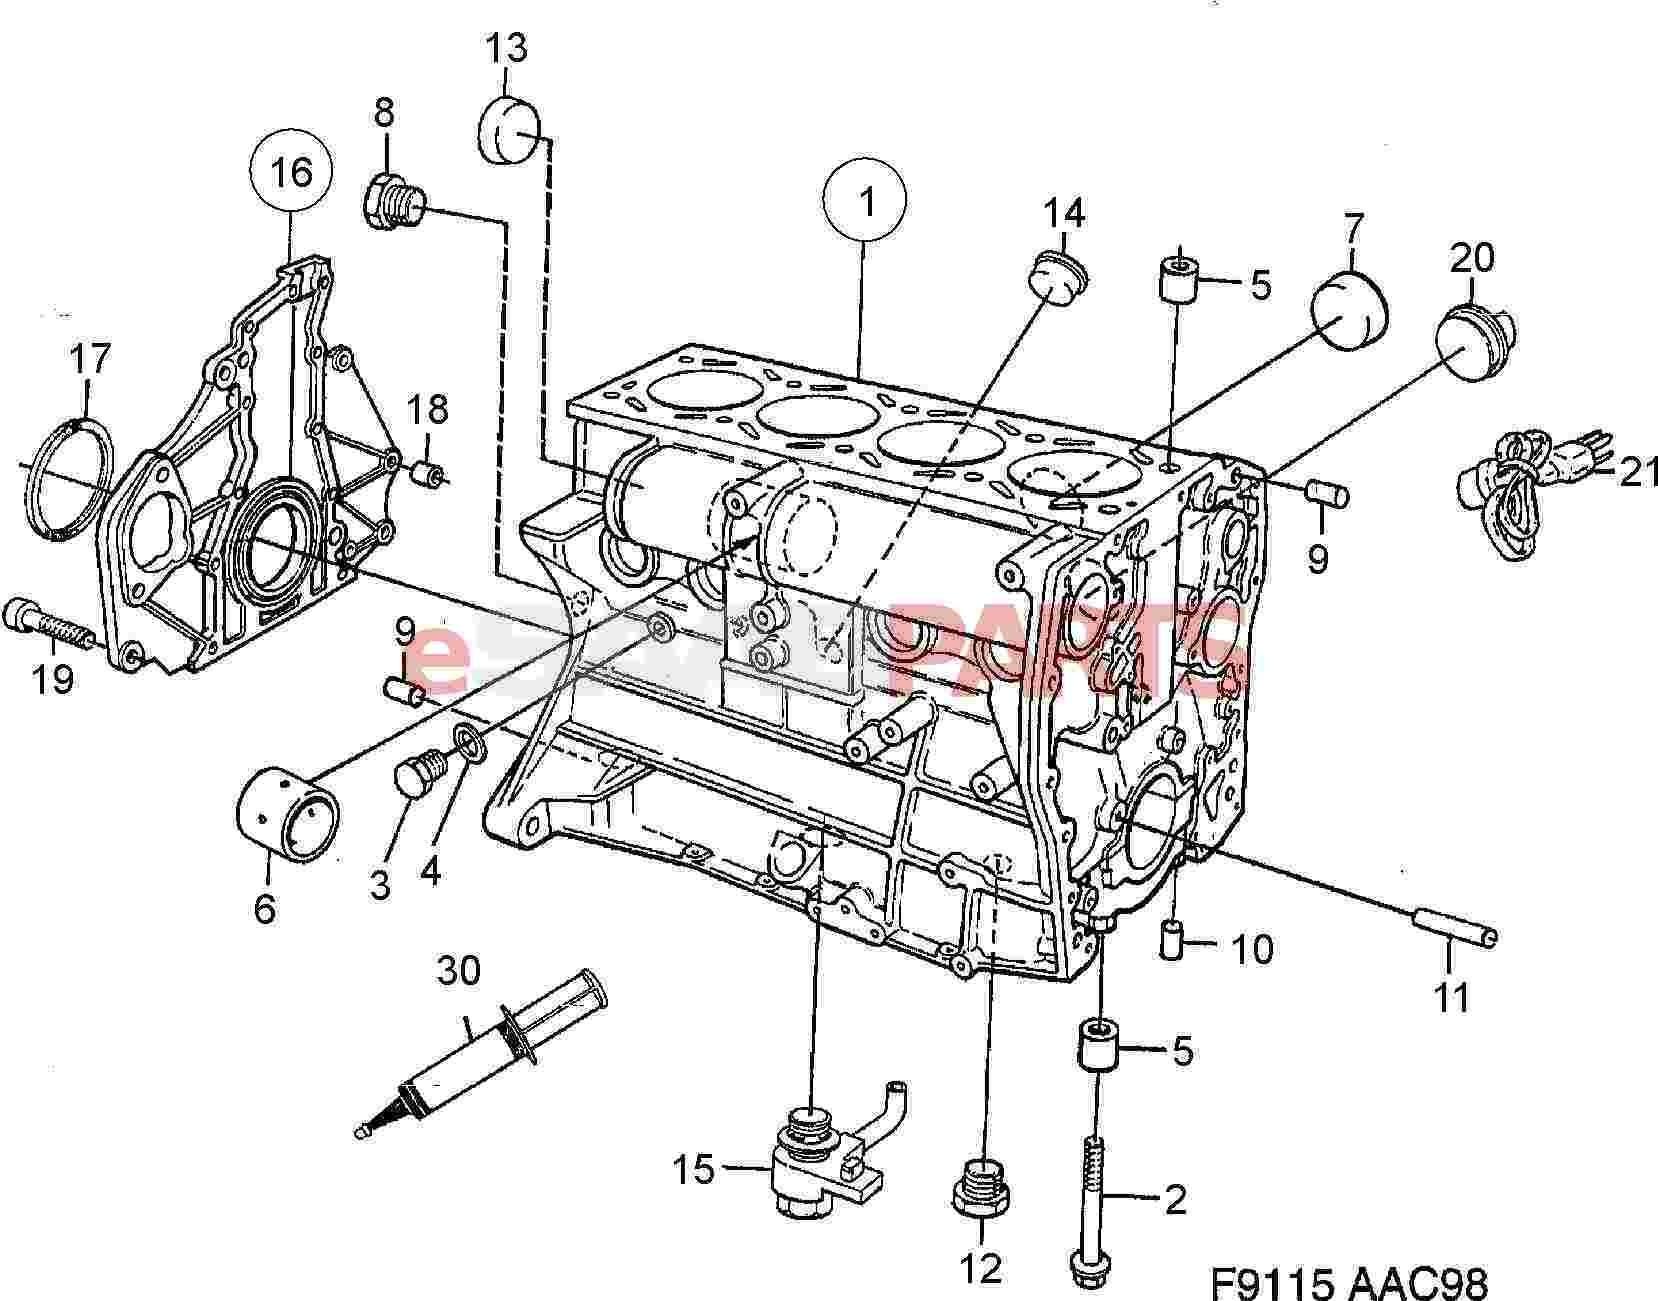 Saab 93 Engine Diagram 2003 Saab 9 3 Convertible Release Motor Rear Diagram  Saab Wiring Of. Related Post